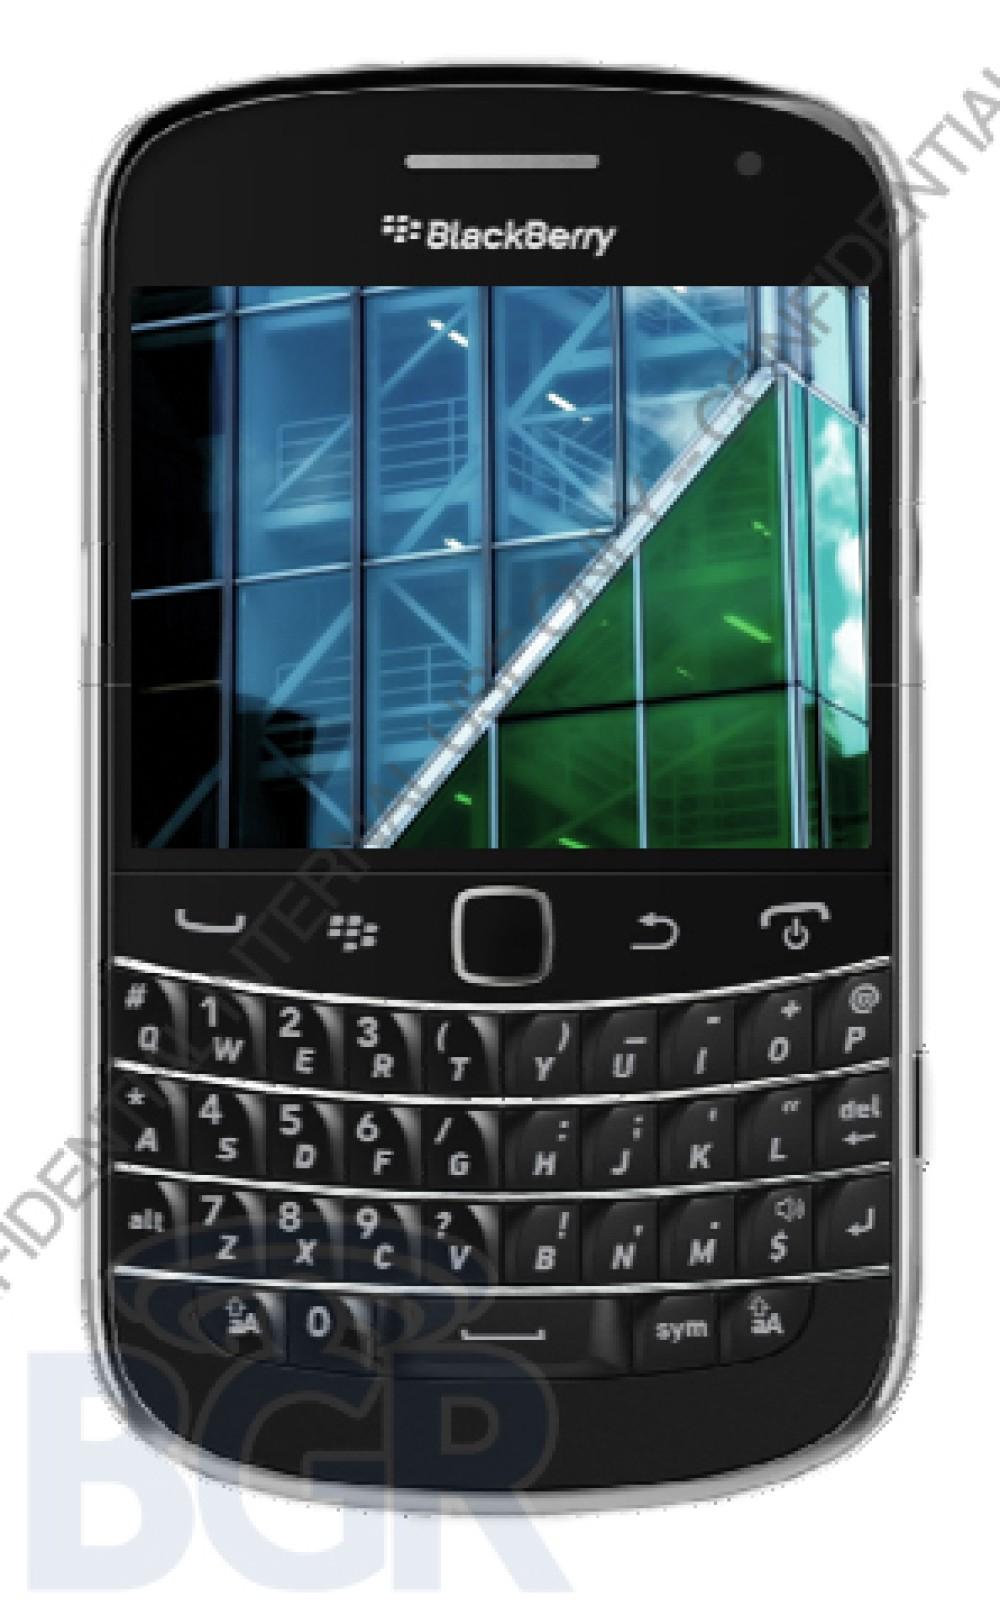 BlackBerry Bold 9930 (Dakota): Επιβεβαίωση μέσα από tutorial videos!